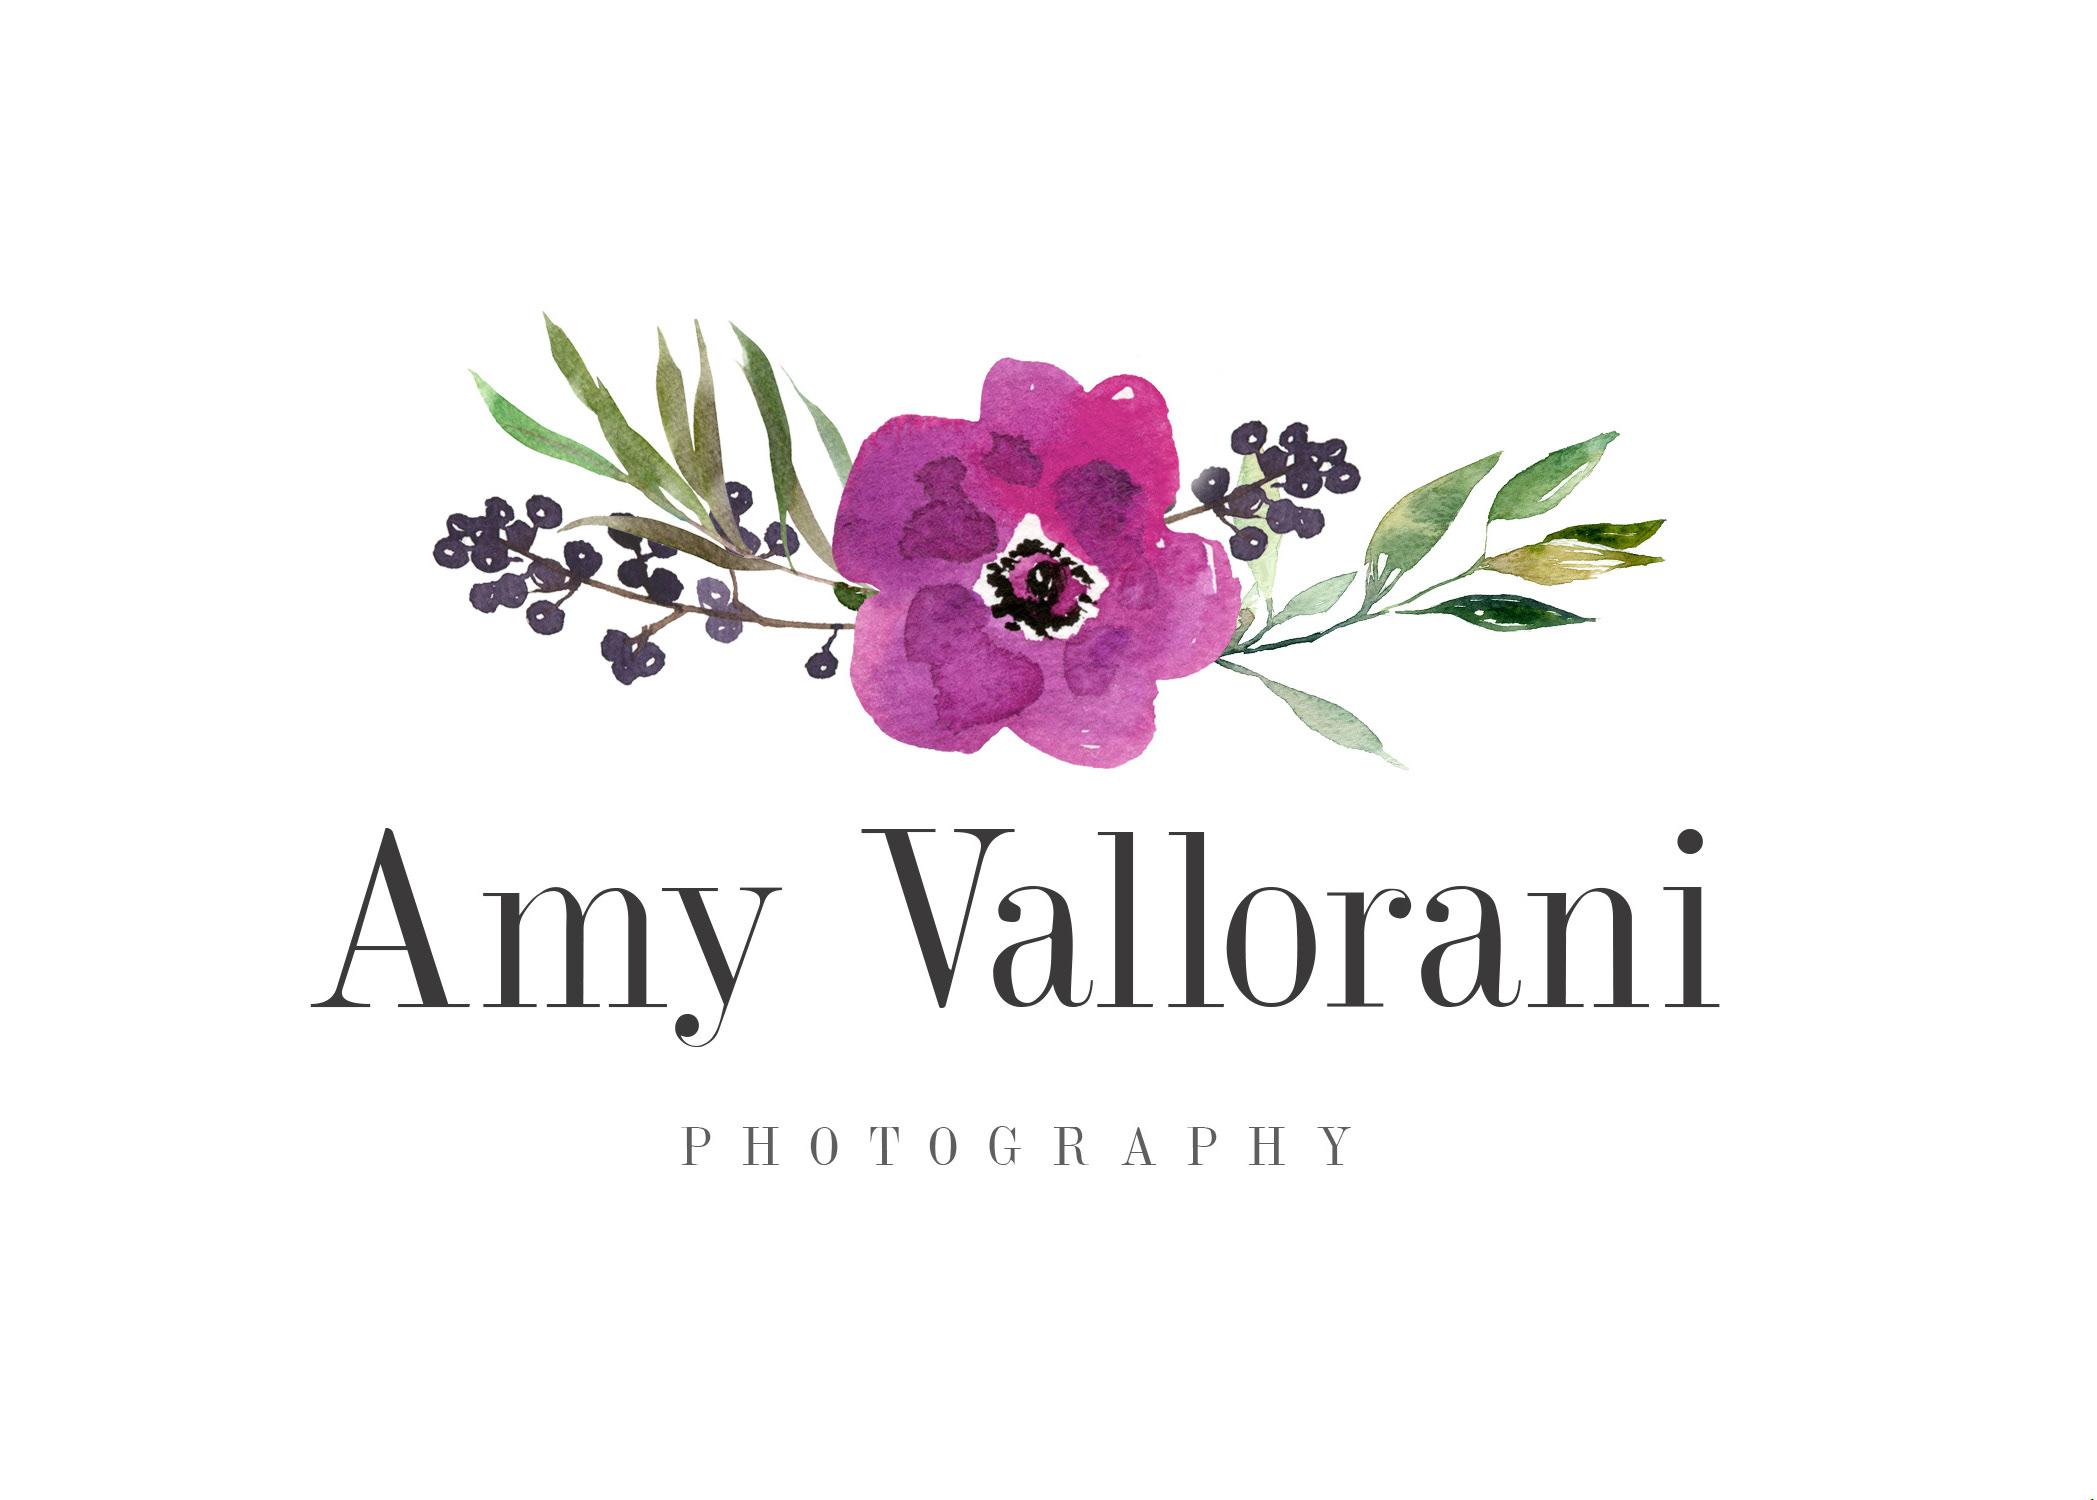 Amy Vallorani